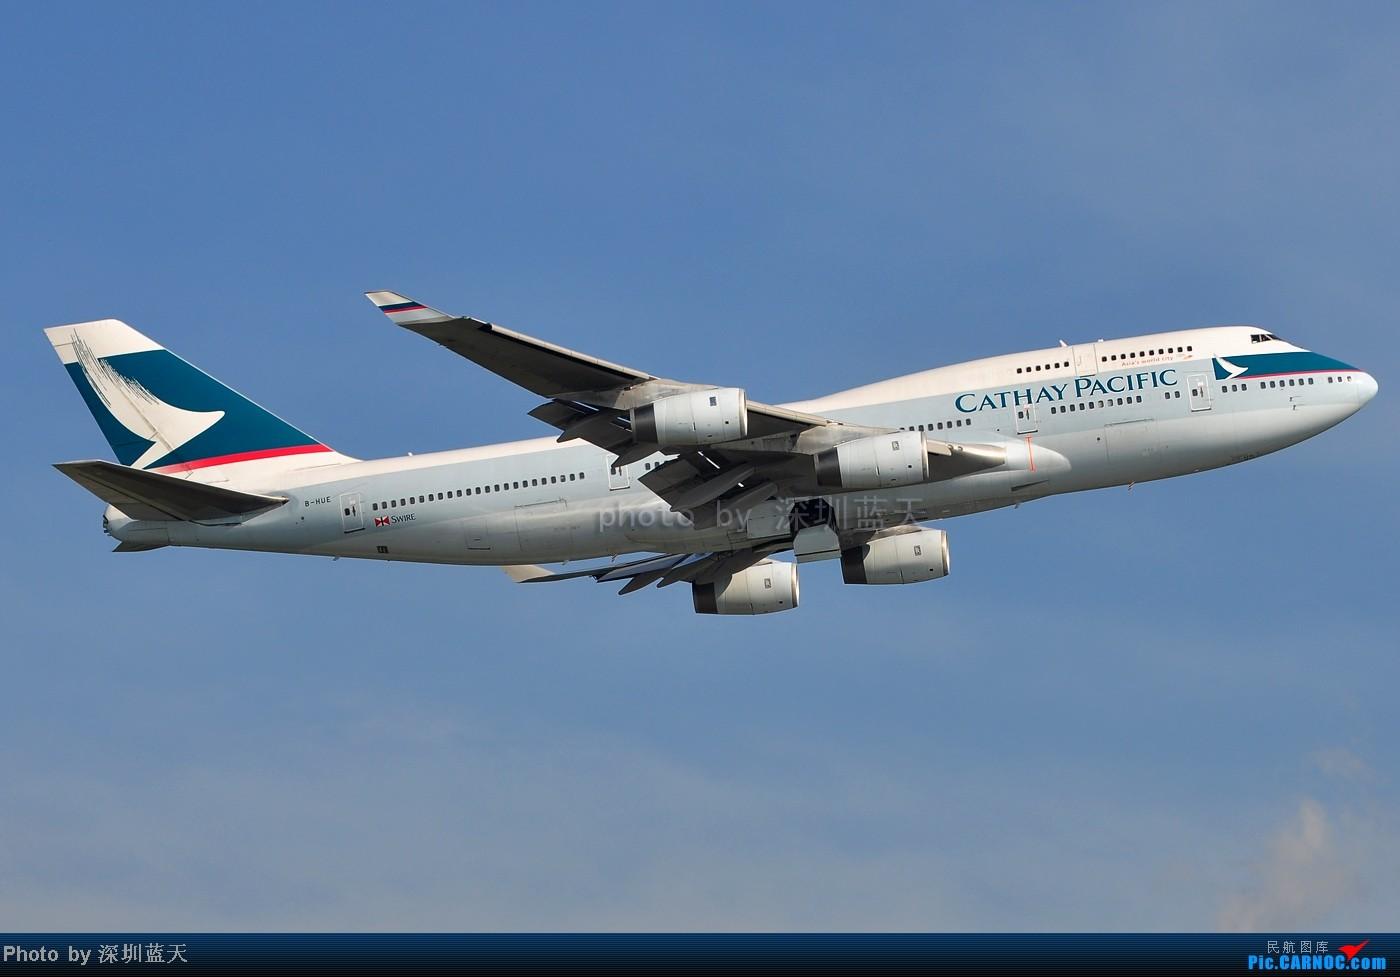 Re:[原创]【深圳飞友会】香港飞机维修区海堤起飞新拍—泰航A380斐济A330新装等 BOEING 747-400 B-HUE 中国香港赤鱲角国际机场